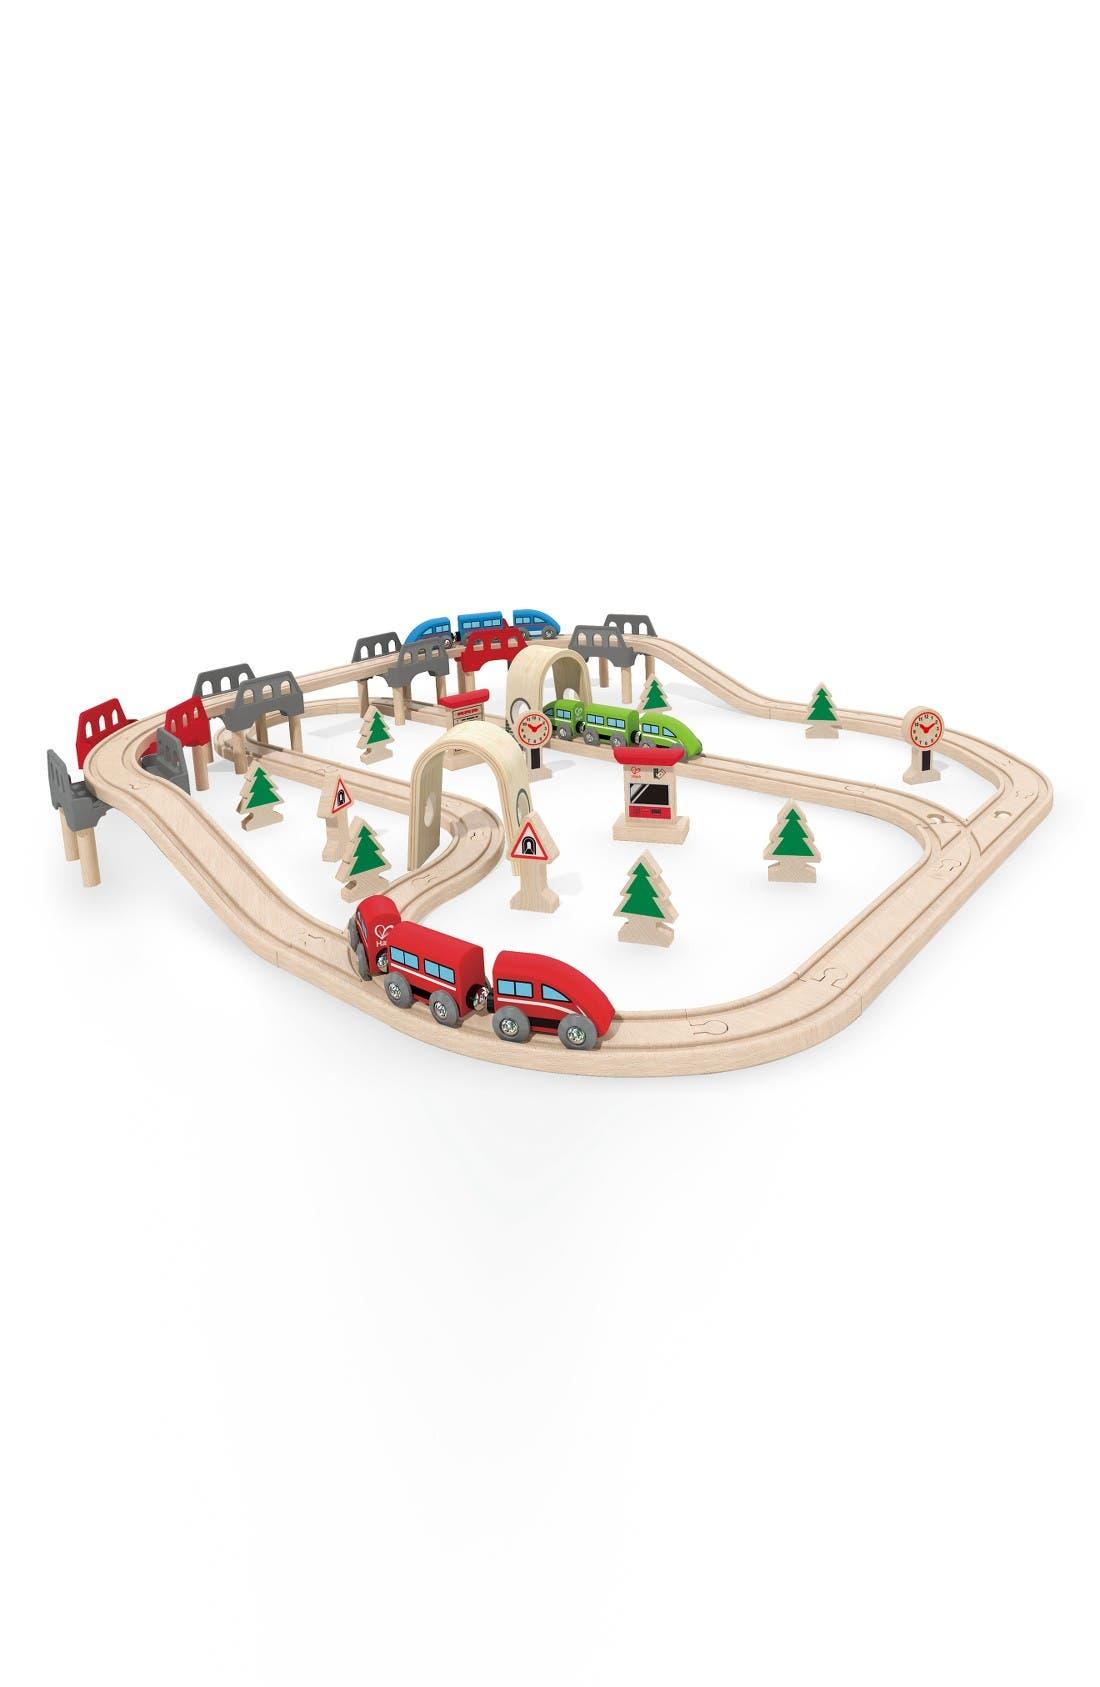 High & Low Railway Set,                             Main thumbnail 1, color,                             Multi